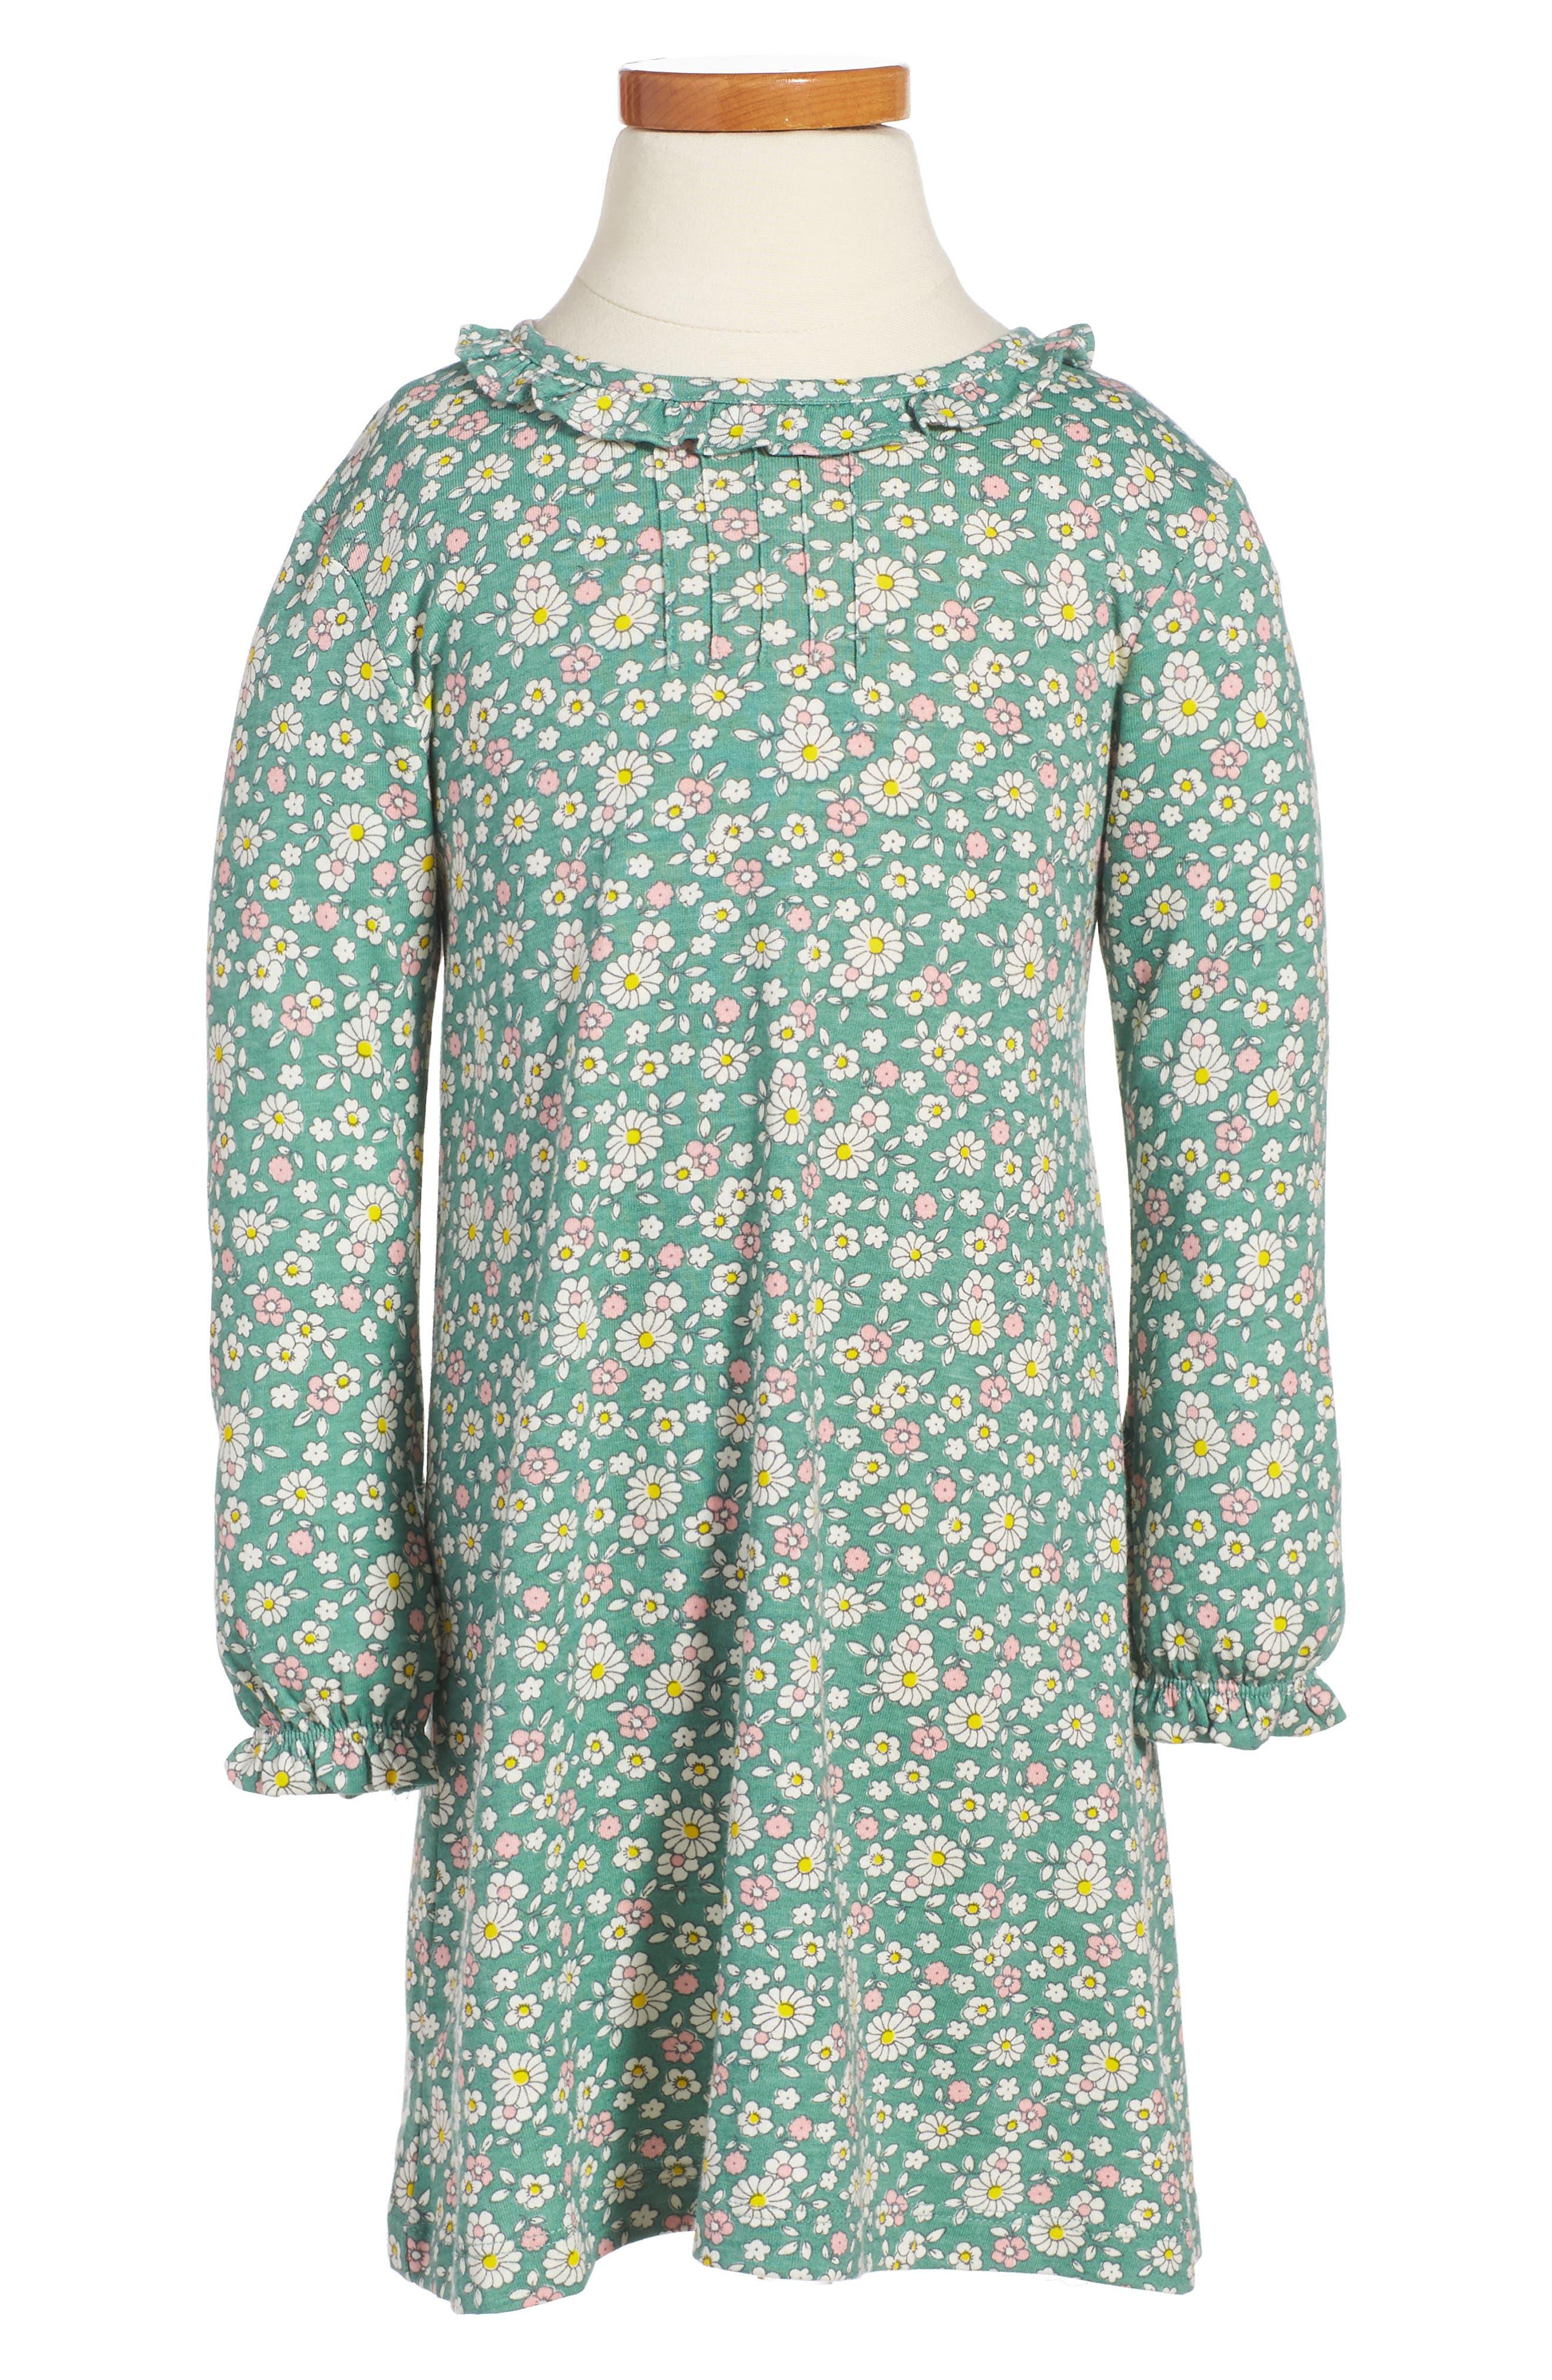 Pretty Print Jersey Dress,                             Main thumbnail 1, color,                             300